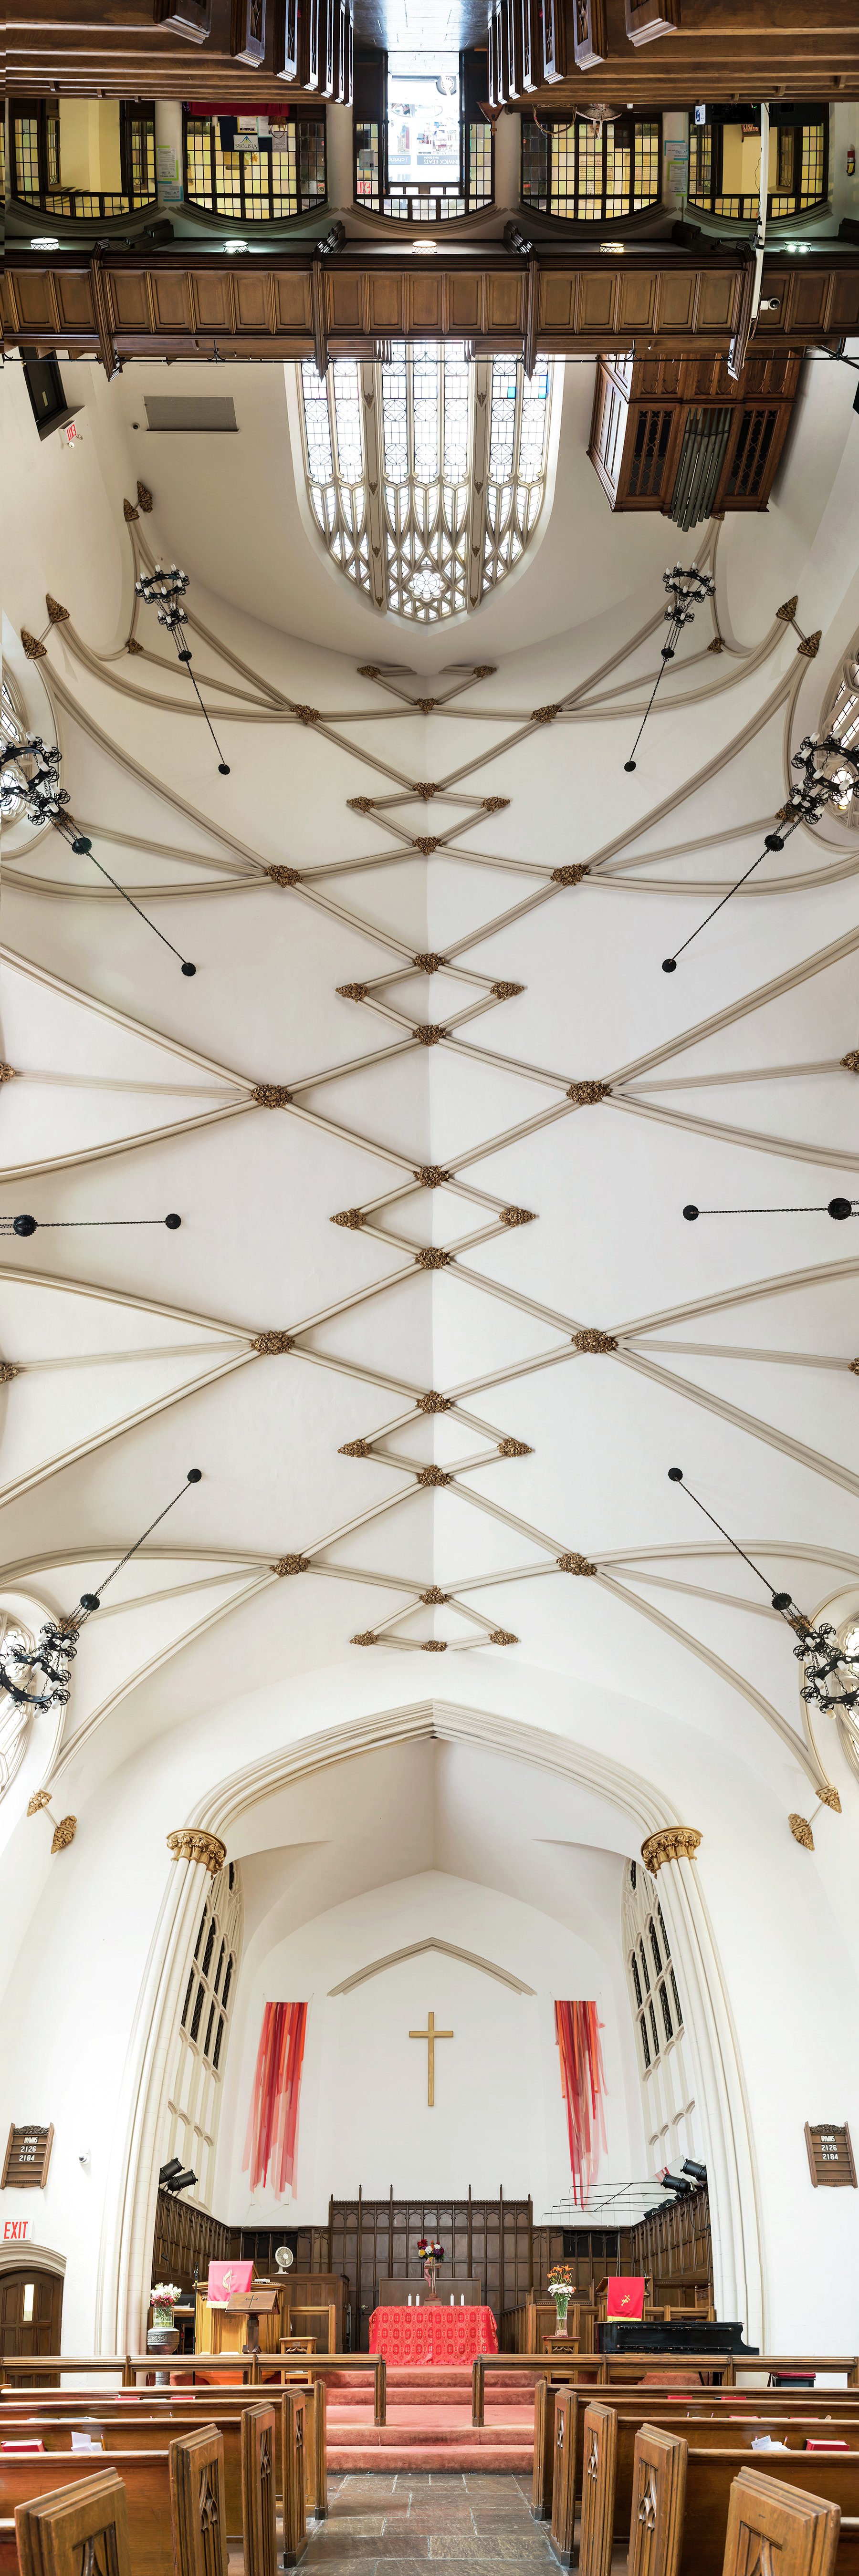 Vertical panoramas of New York churches